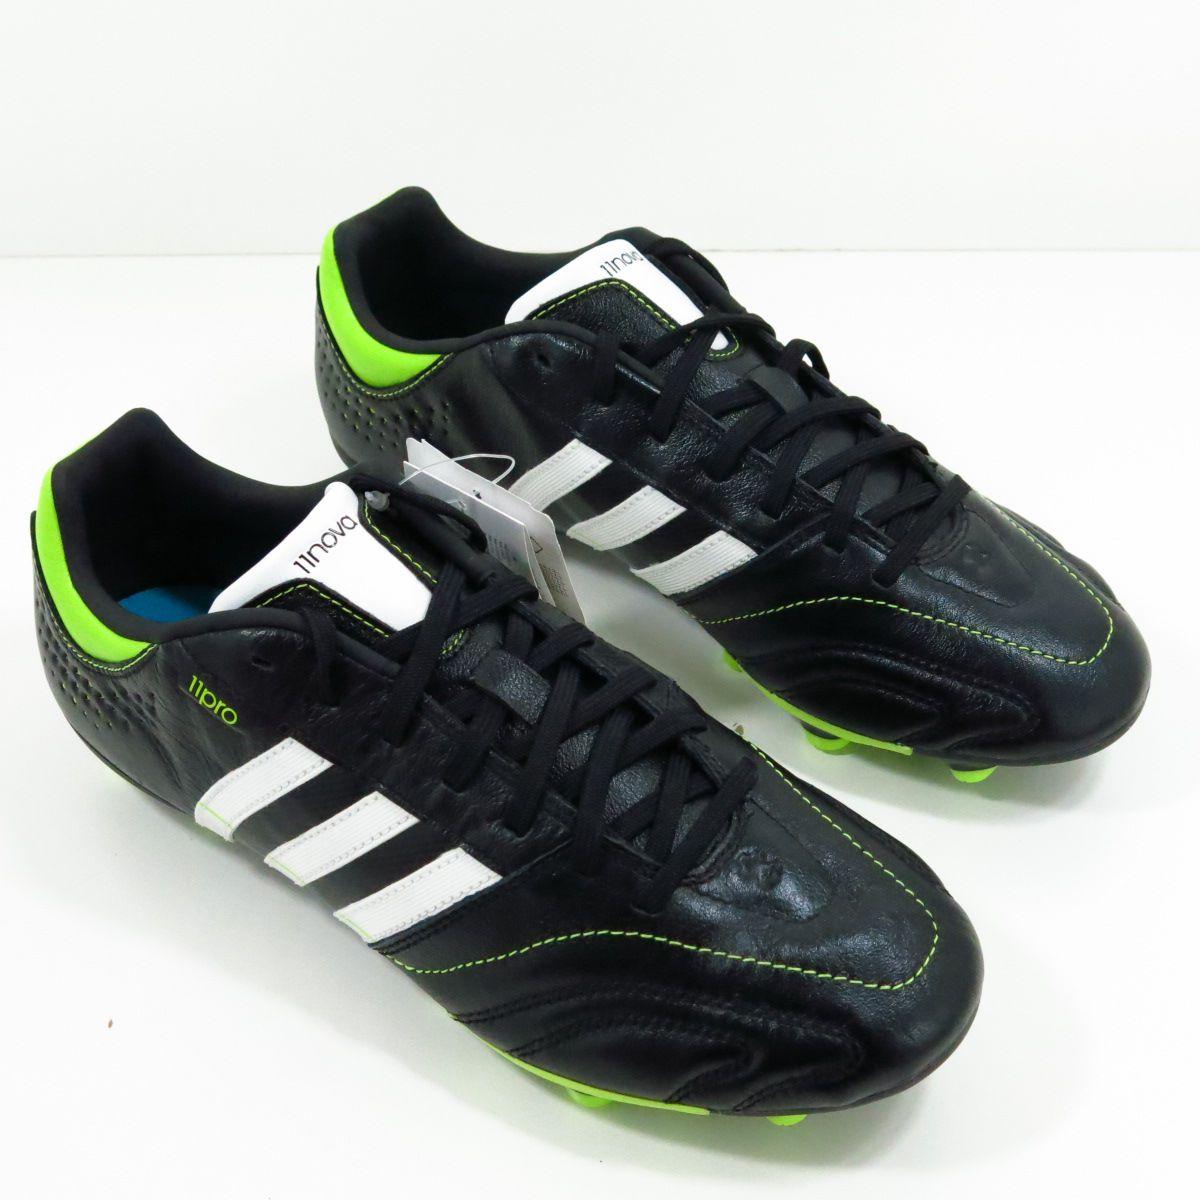 Chuteira Adidas Adipure 11NOVA FG - Couro